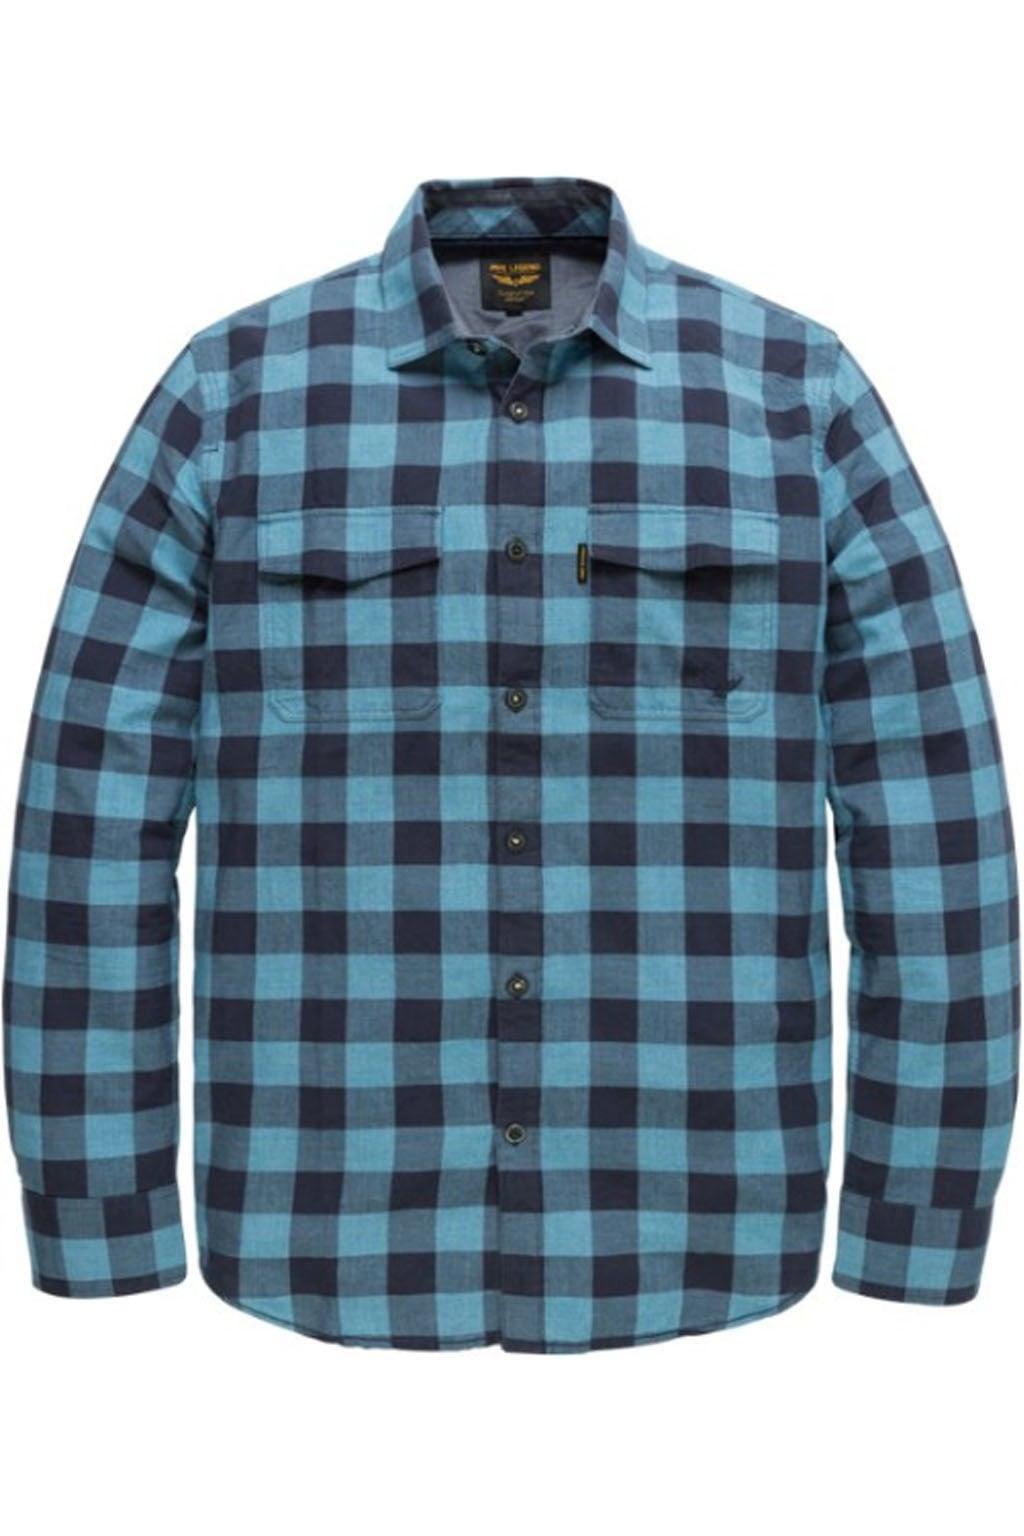 Overhemd Blauw.Pme Legend Grindle Check George Overhemd Blauw Koop Je Kellyjeans Nl